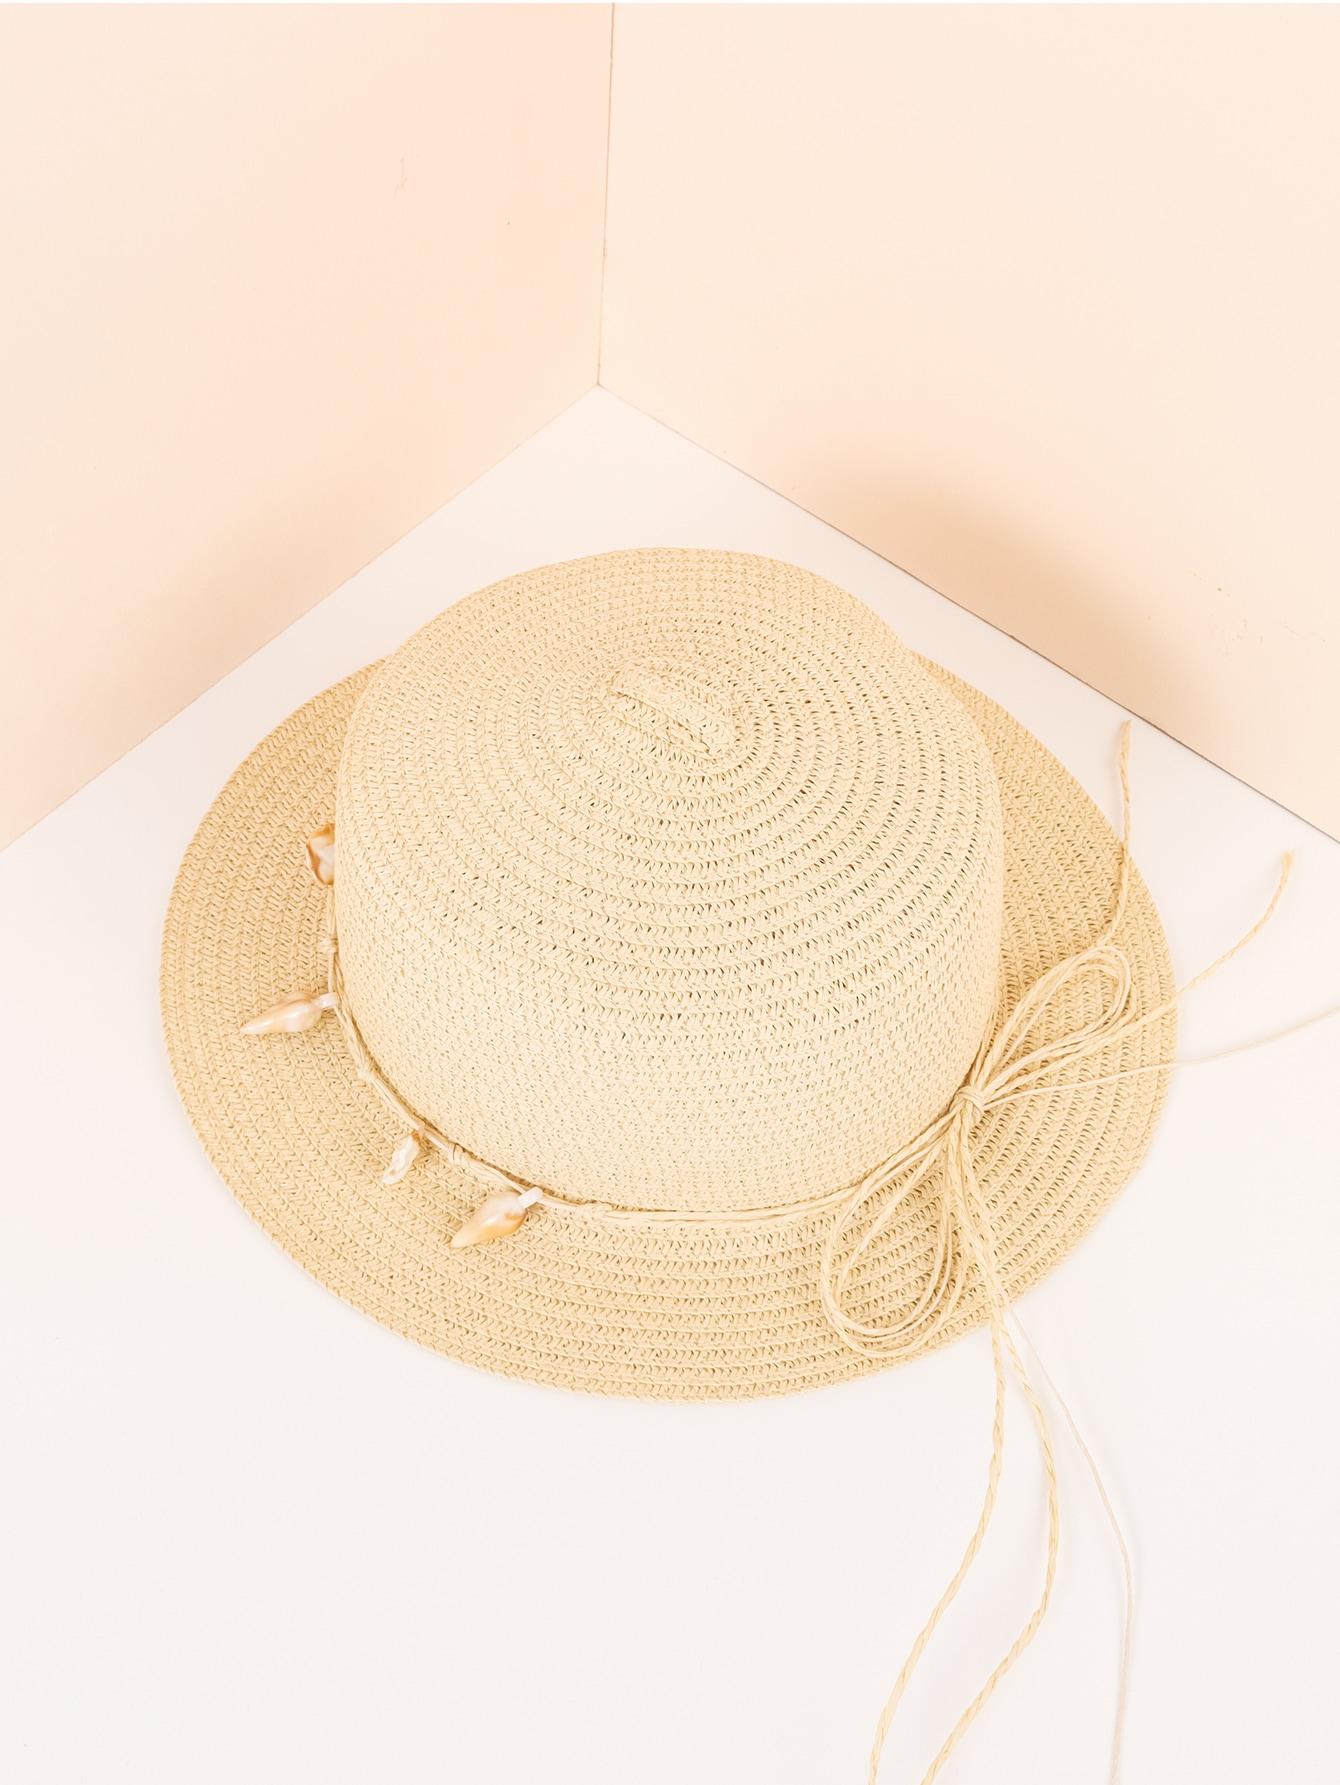 conch decor straw hat